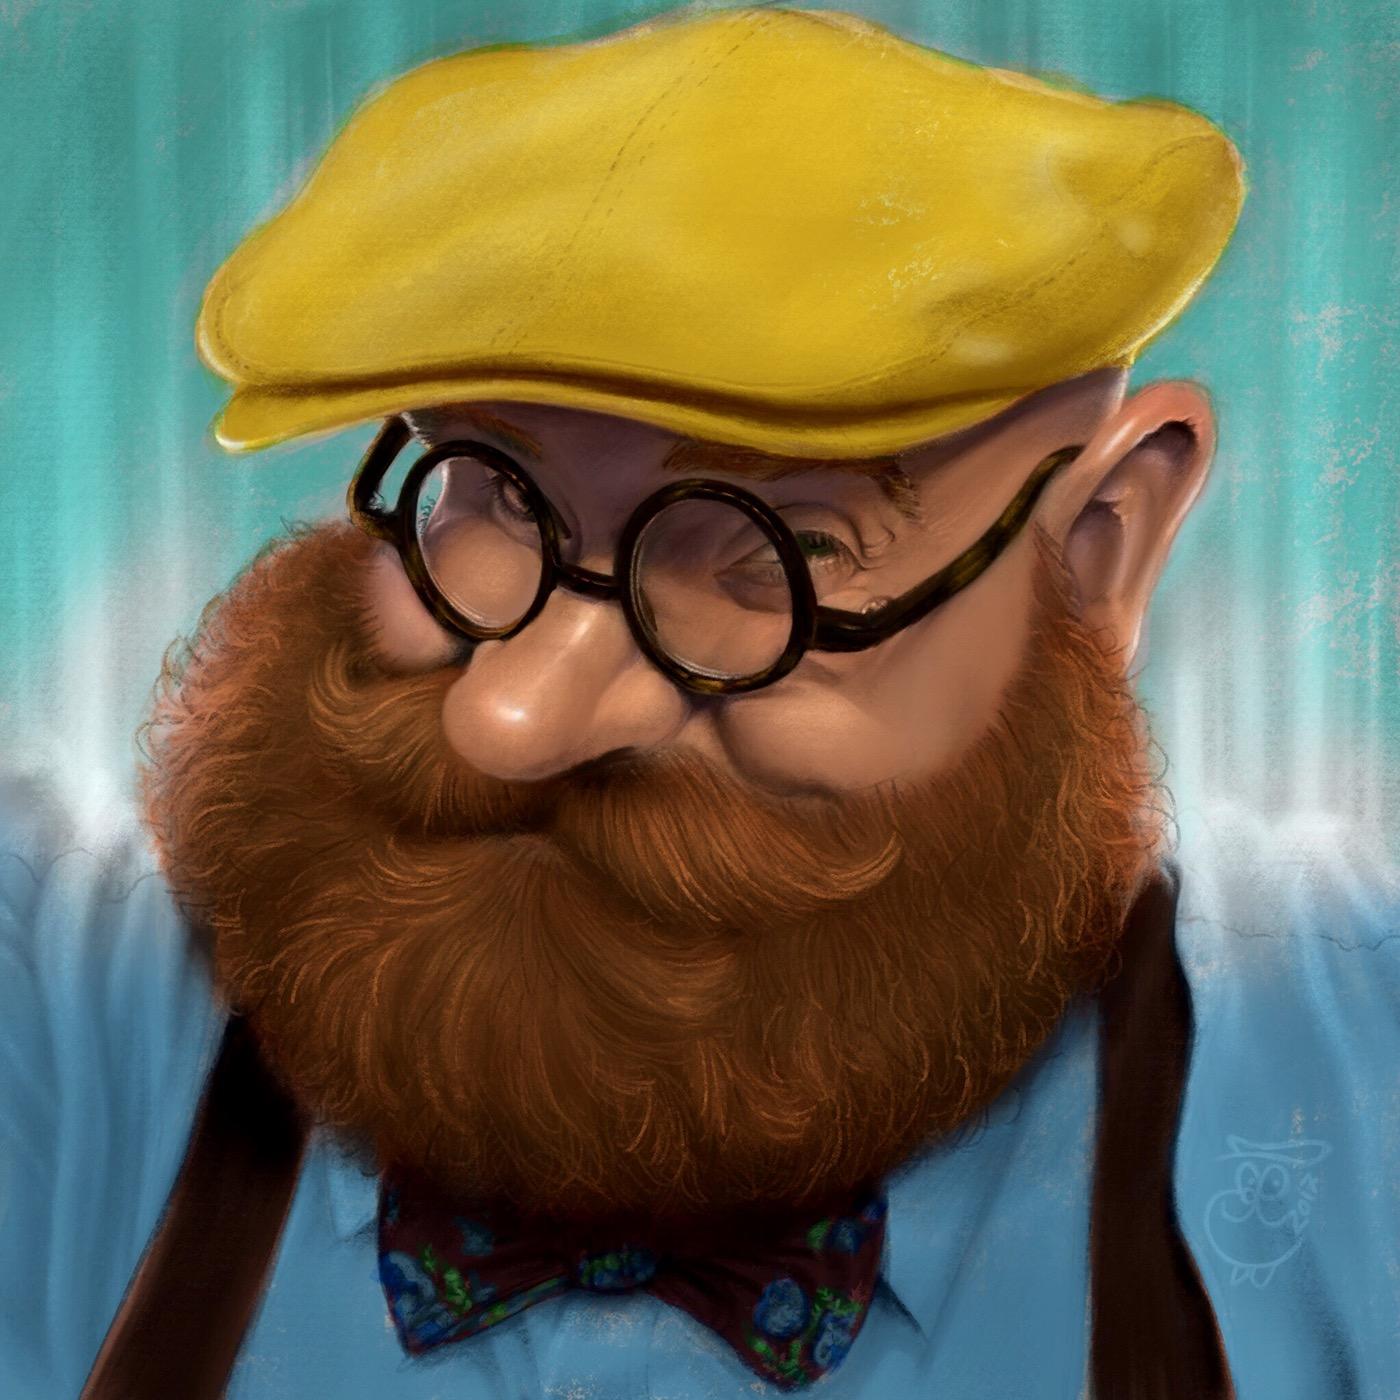 caricature   digital painting Procreate ipad pro